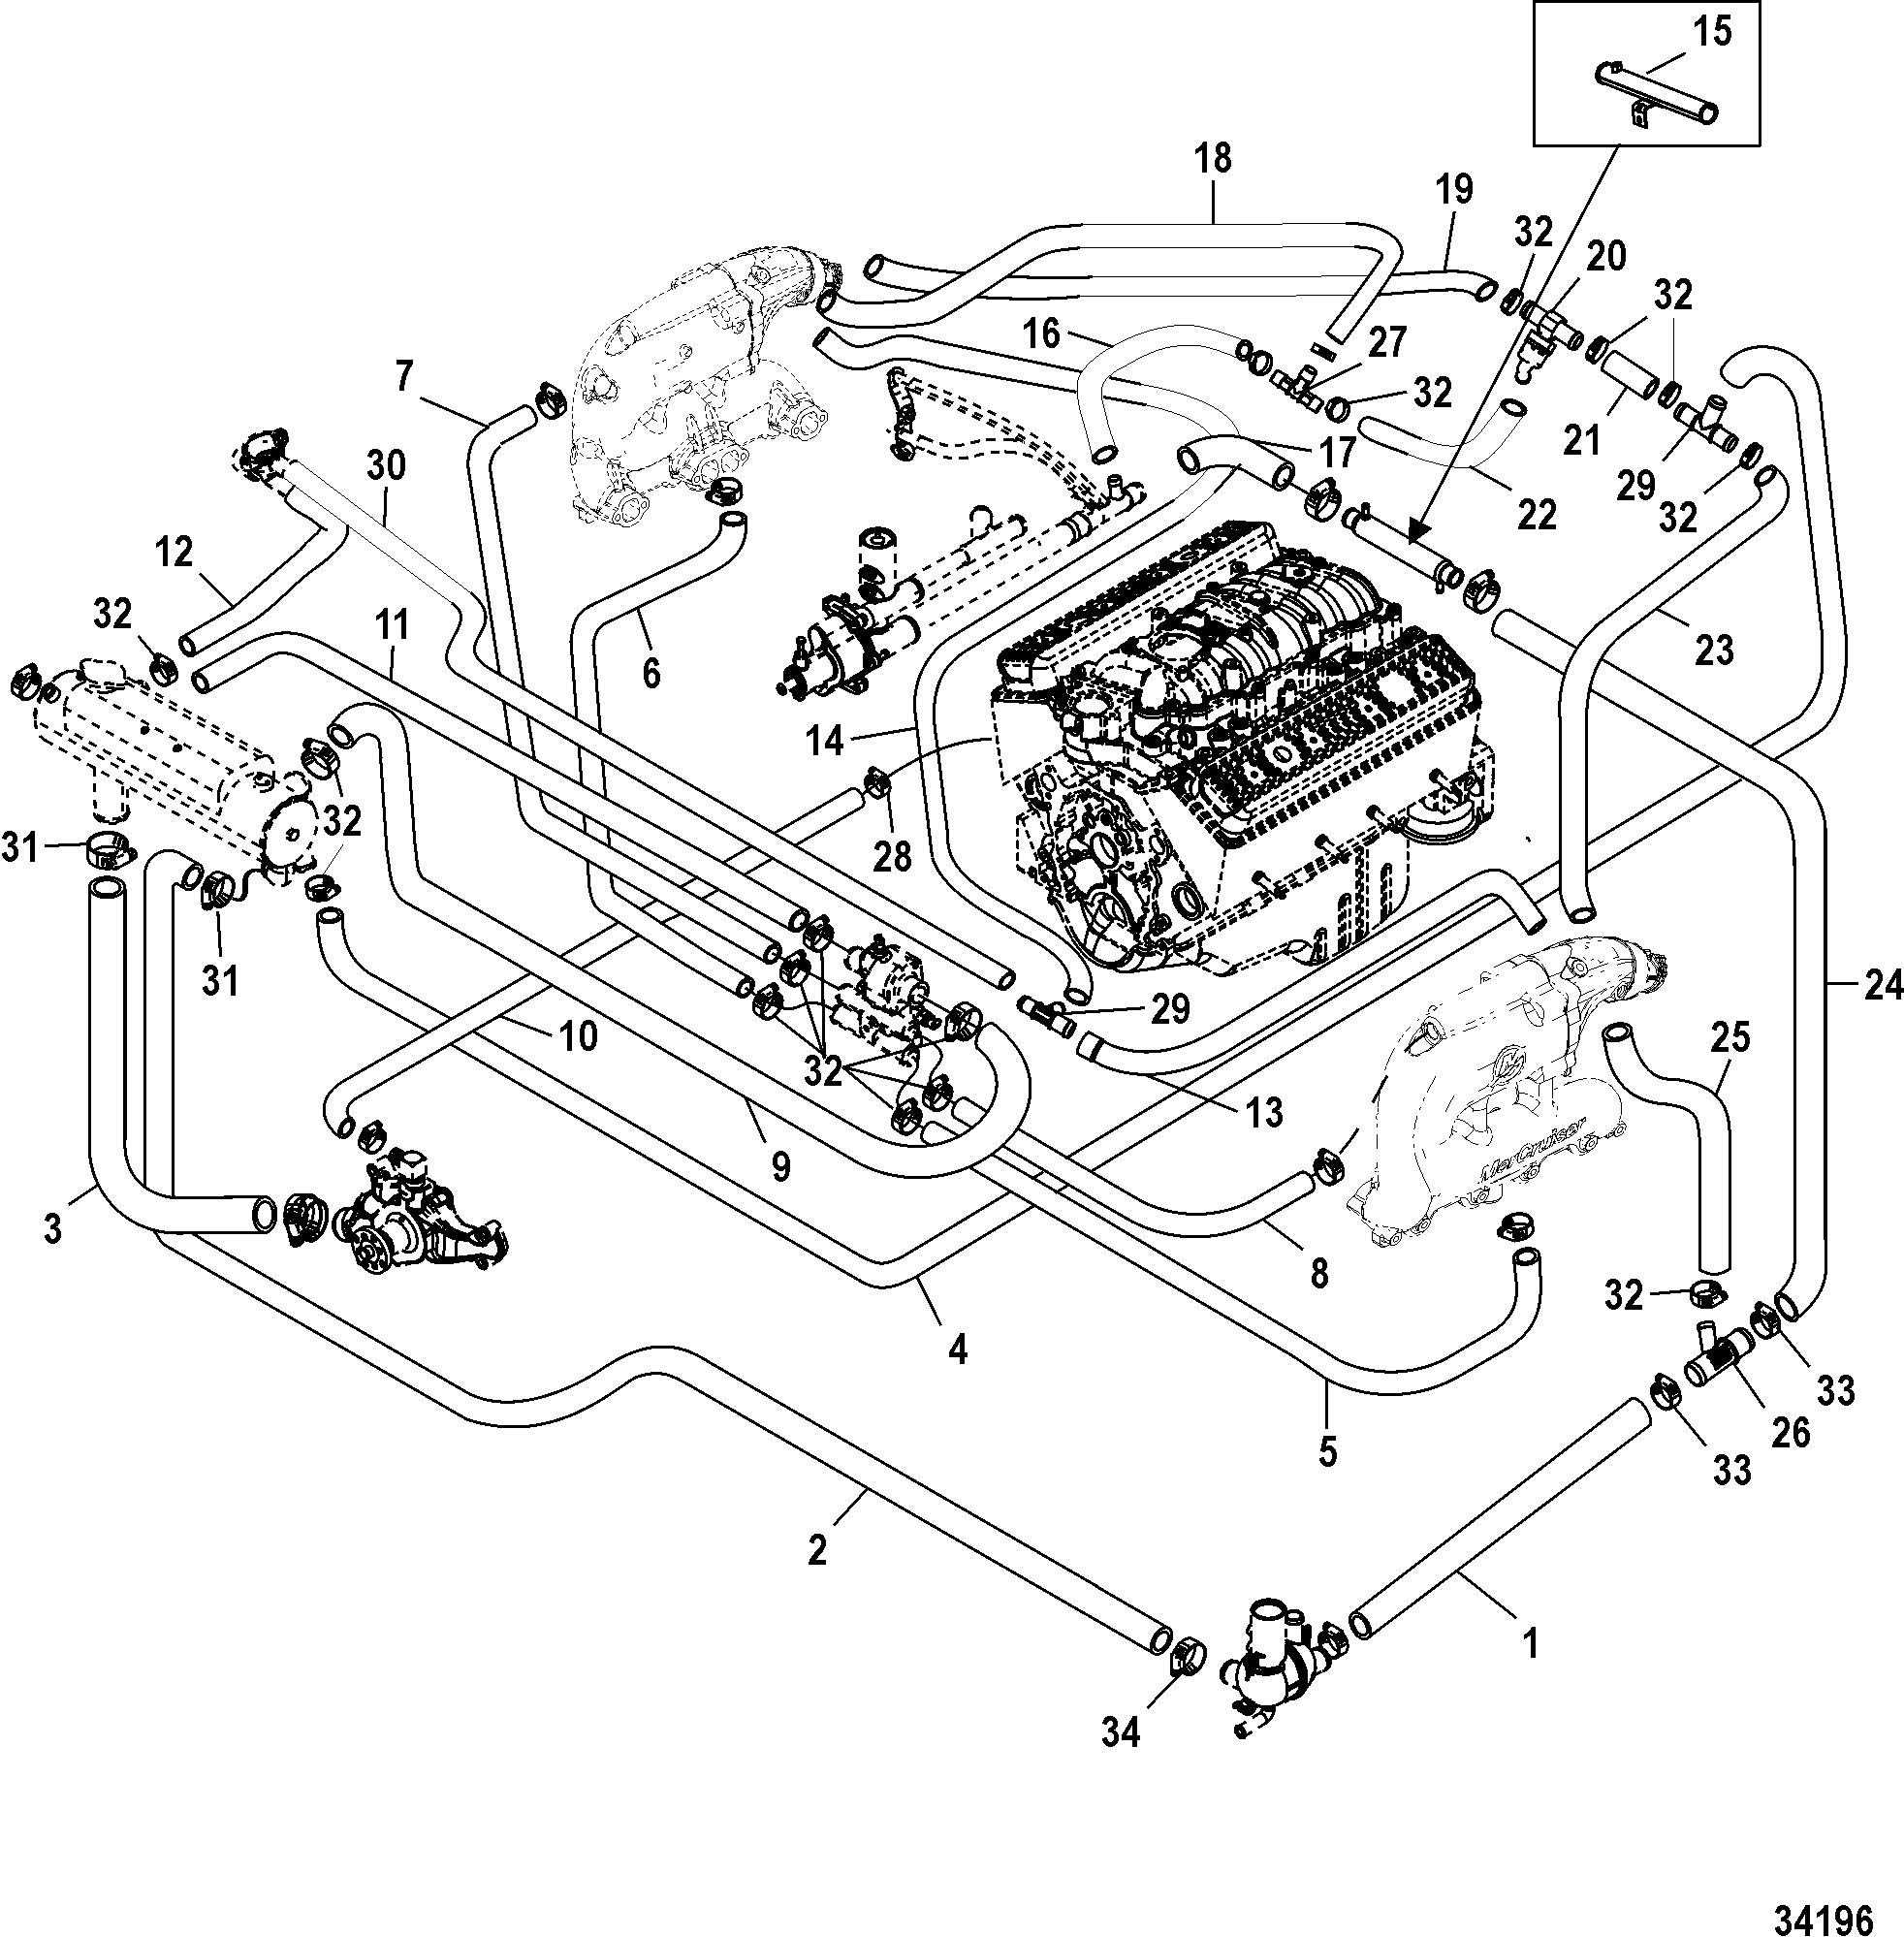 hight resolution of 454 mercruiser engine wiring diagram wiring library mercruiser 5 7 wiring diagram